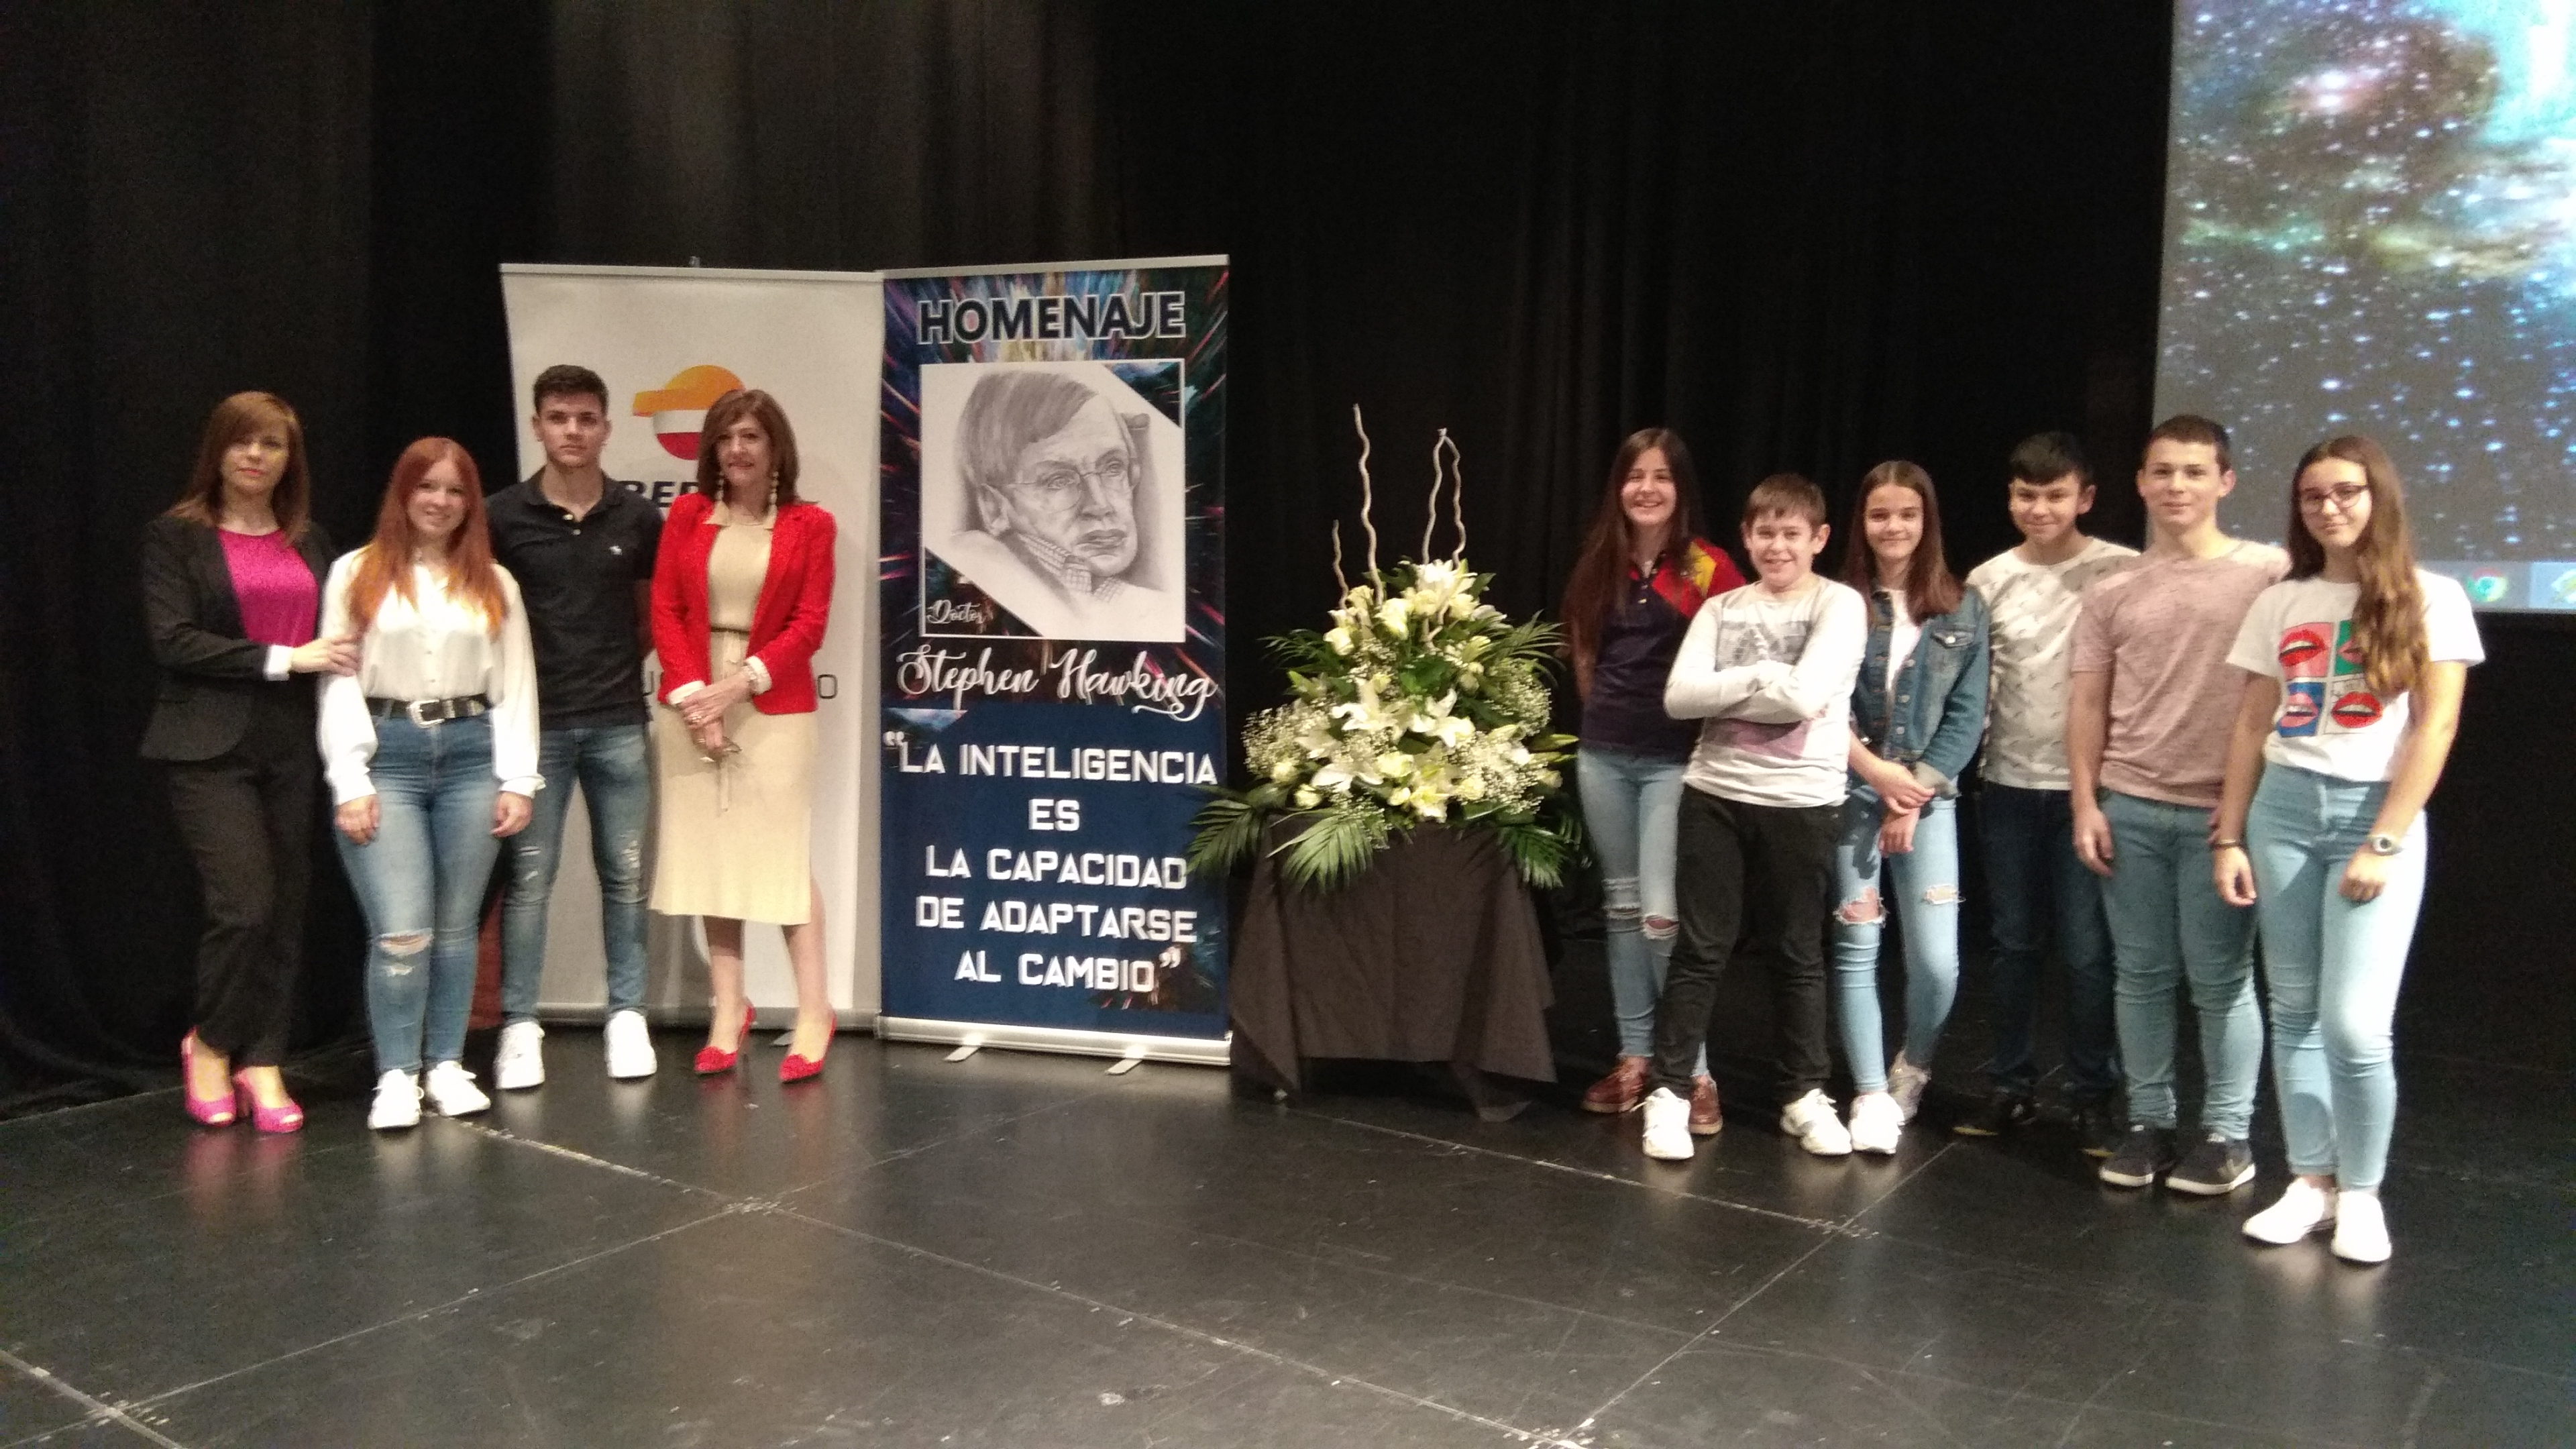 Homenaje a Stephen Hawking del IES Leonardo Da Vinci